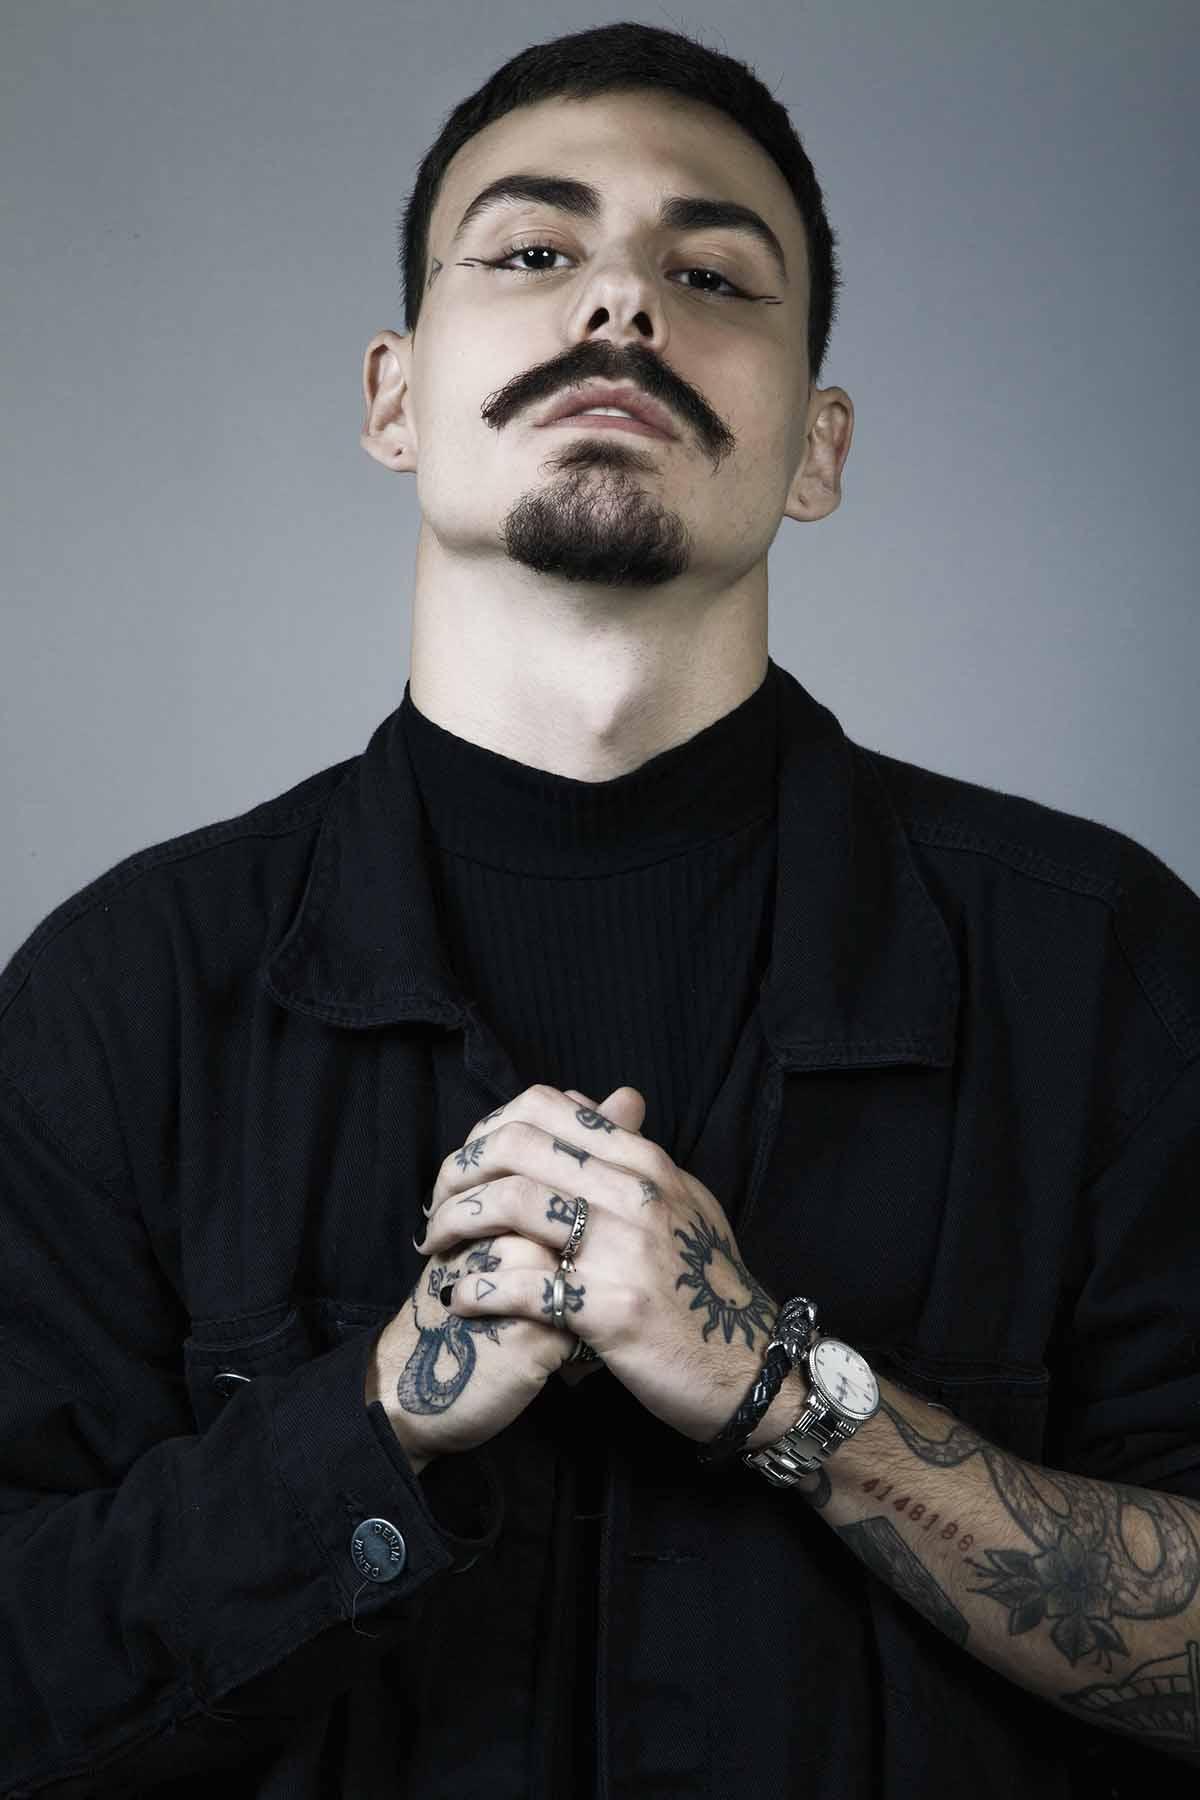 Gabriel Espanhol by Matheus Muraca for Brazilian Male Model